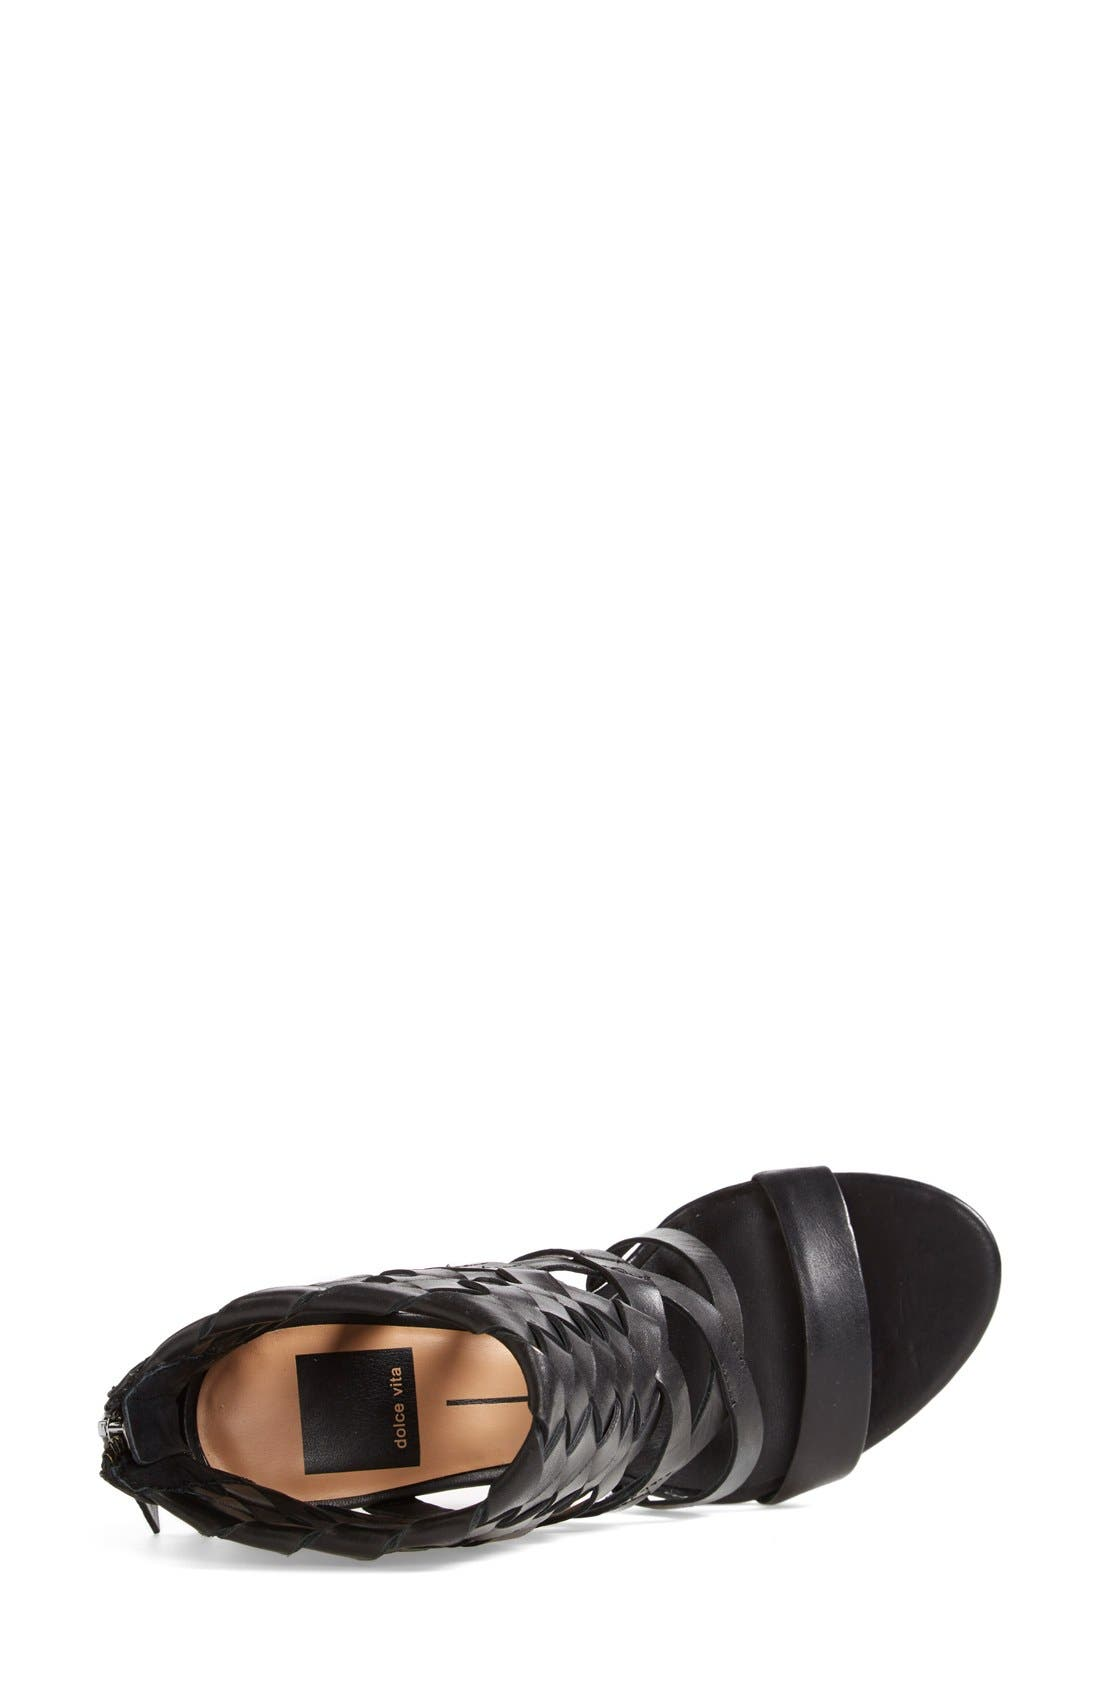 Alternate Image 3  - Dolce Vita 'Nakita' Woven Leather Sandal